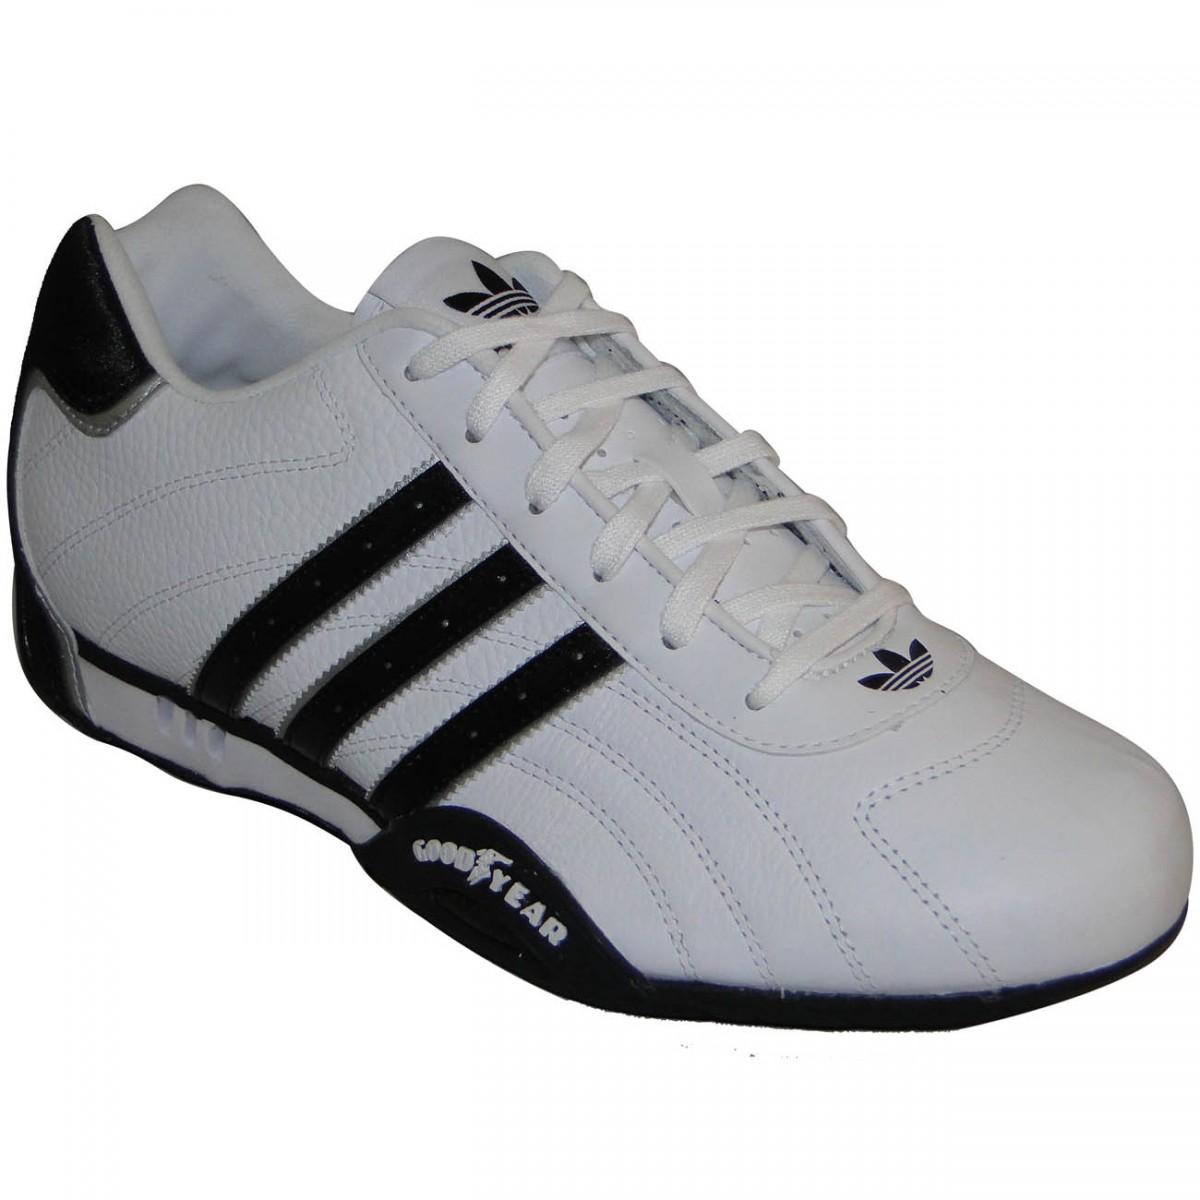 Adidas Tenis Racer Tenis Adidas Low Adi Adi DHE9Ybe2IW